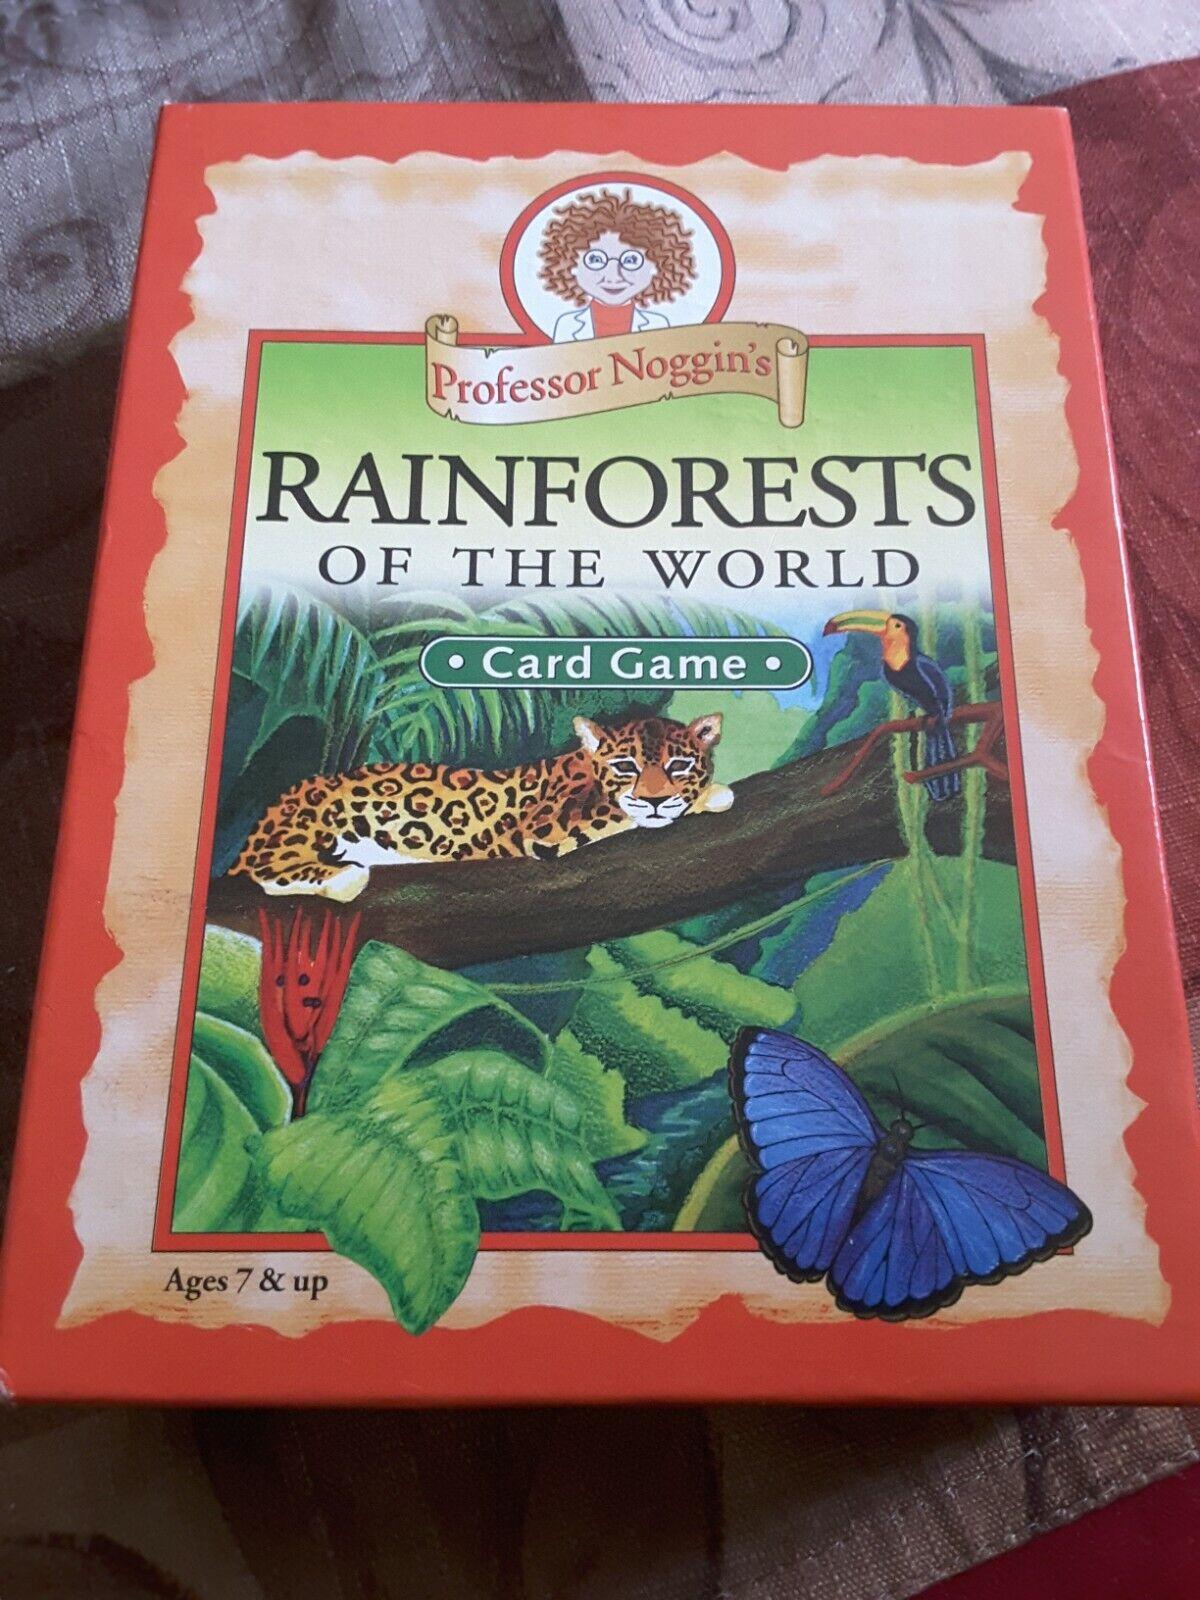 (Rainforests of the World) - Educational Trivia Card Game - Professor Noggin's 2